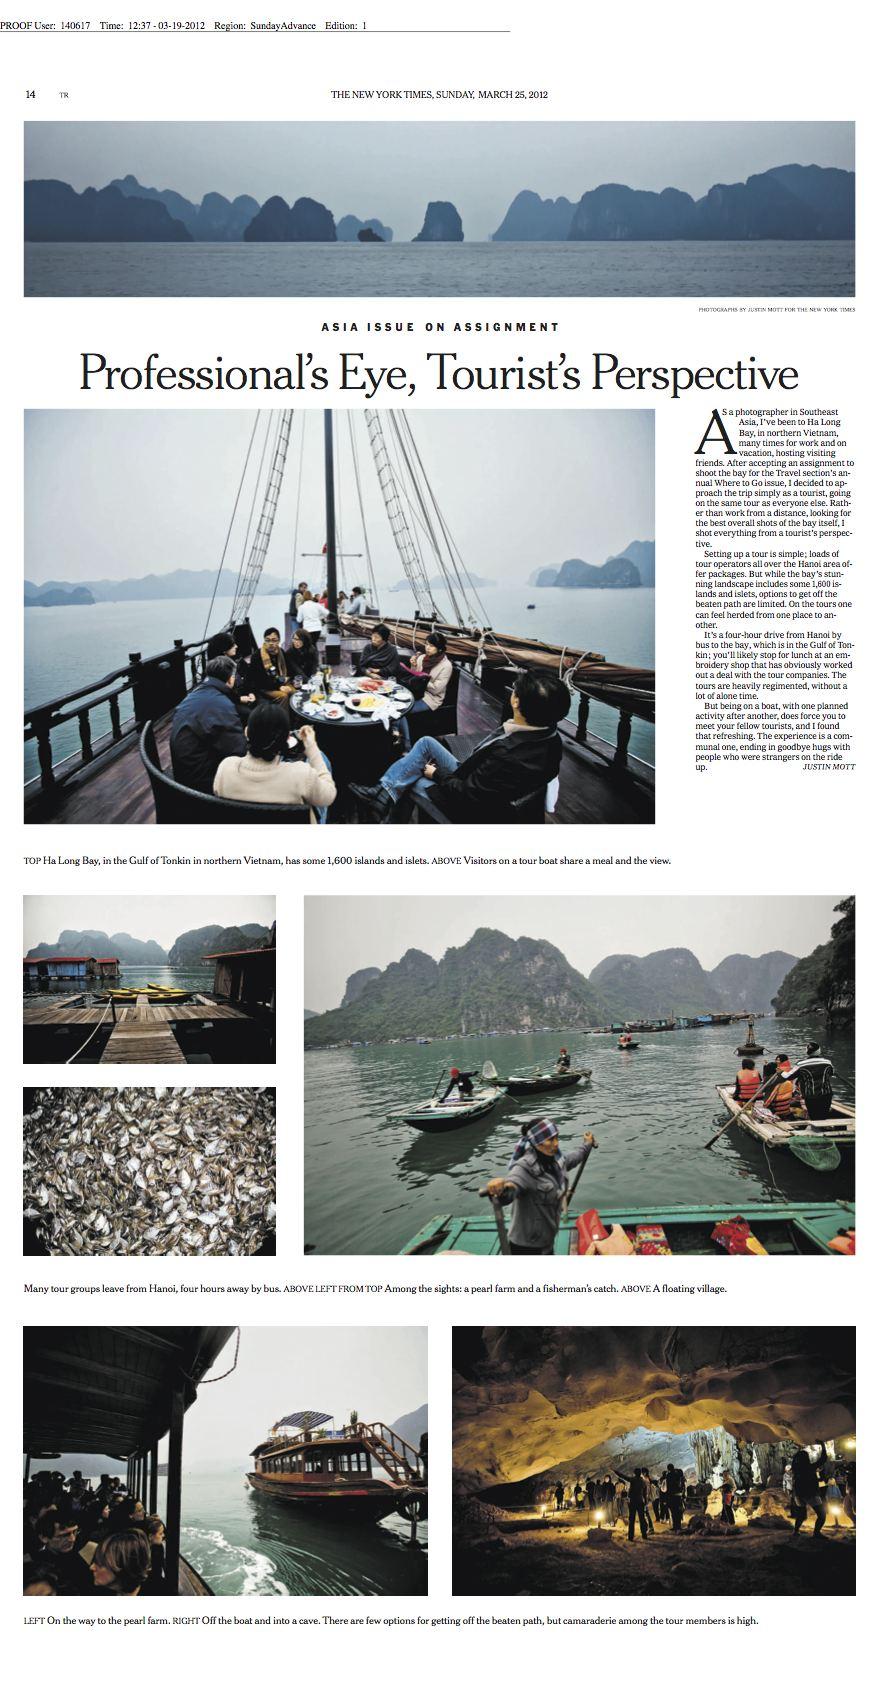 Justin_Mott_Travel_Photography_Hanoi_Vietnam-1.jpg